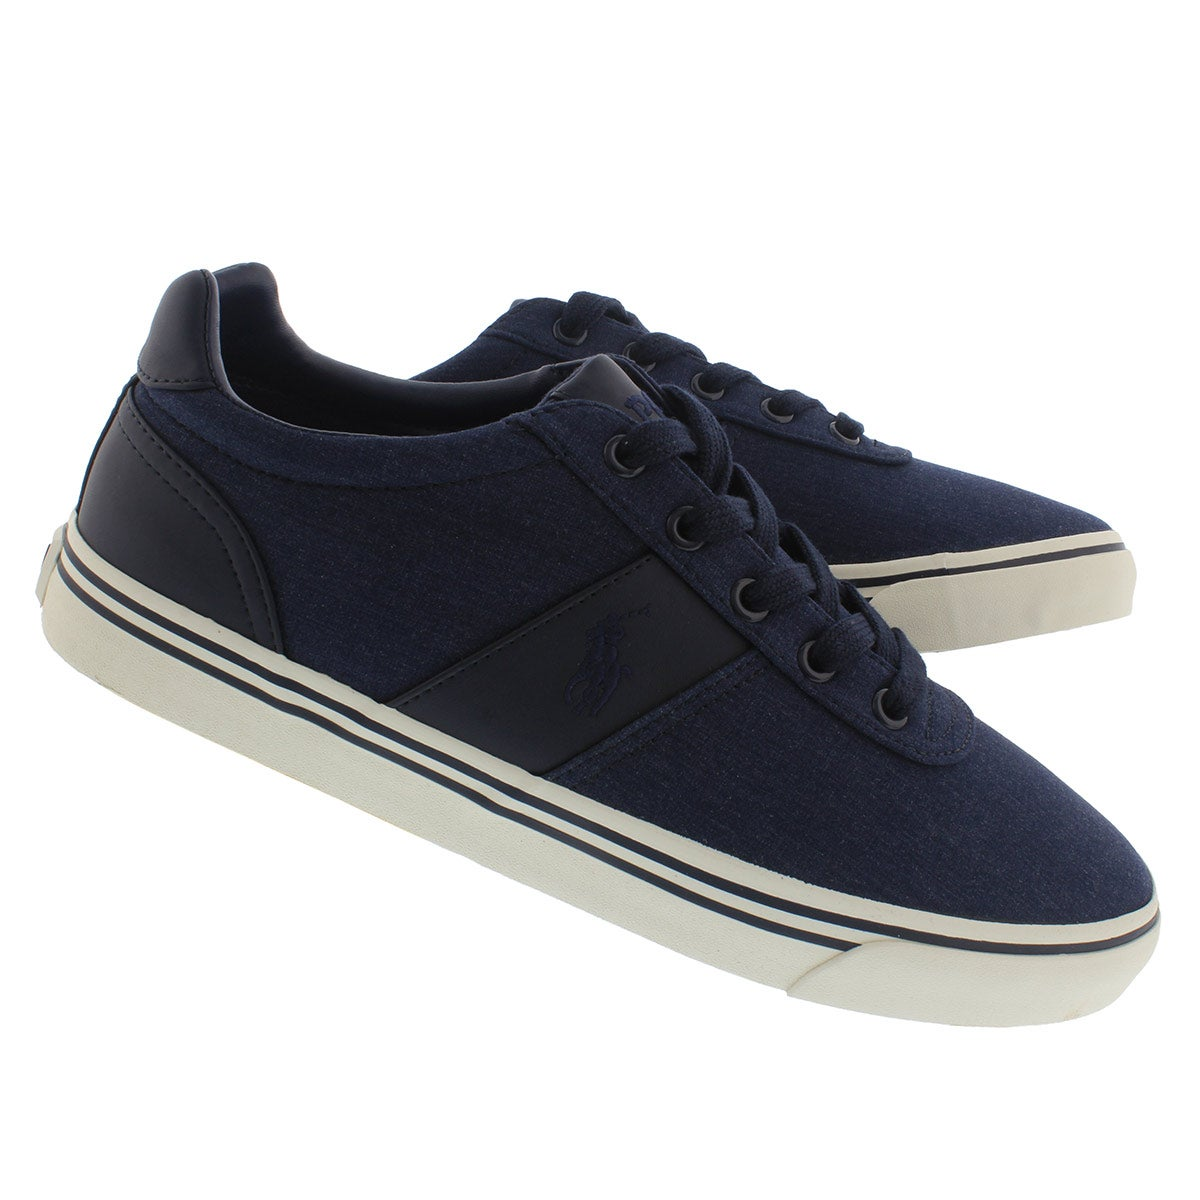 Mns Hanford navy fashion sneaker